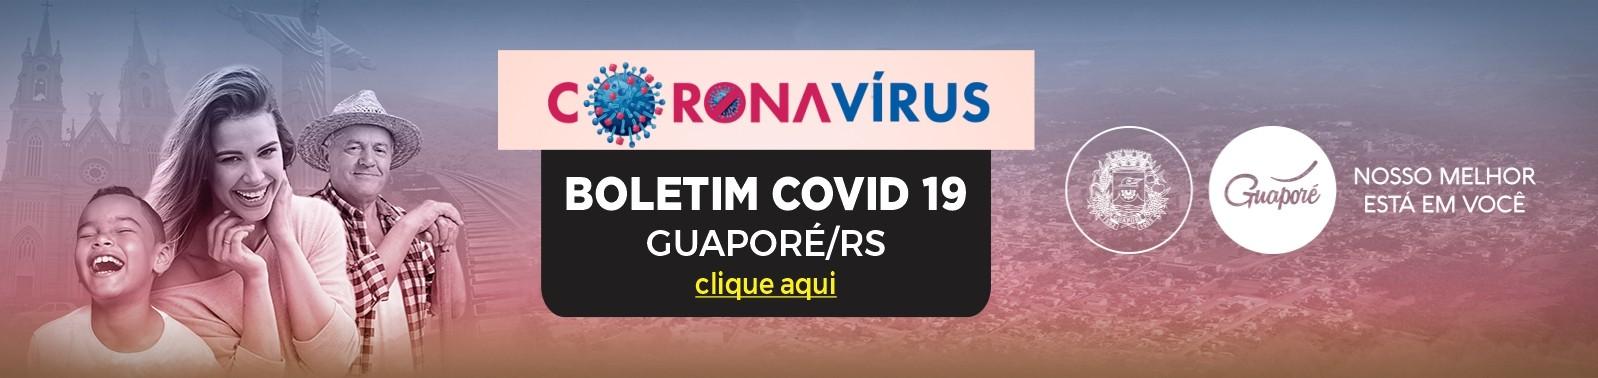 Banner 2 - CAPA - Boletim Coronavírus